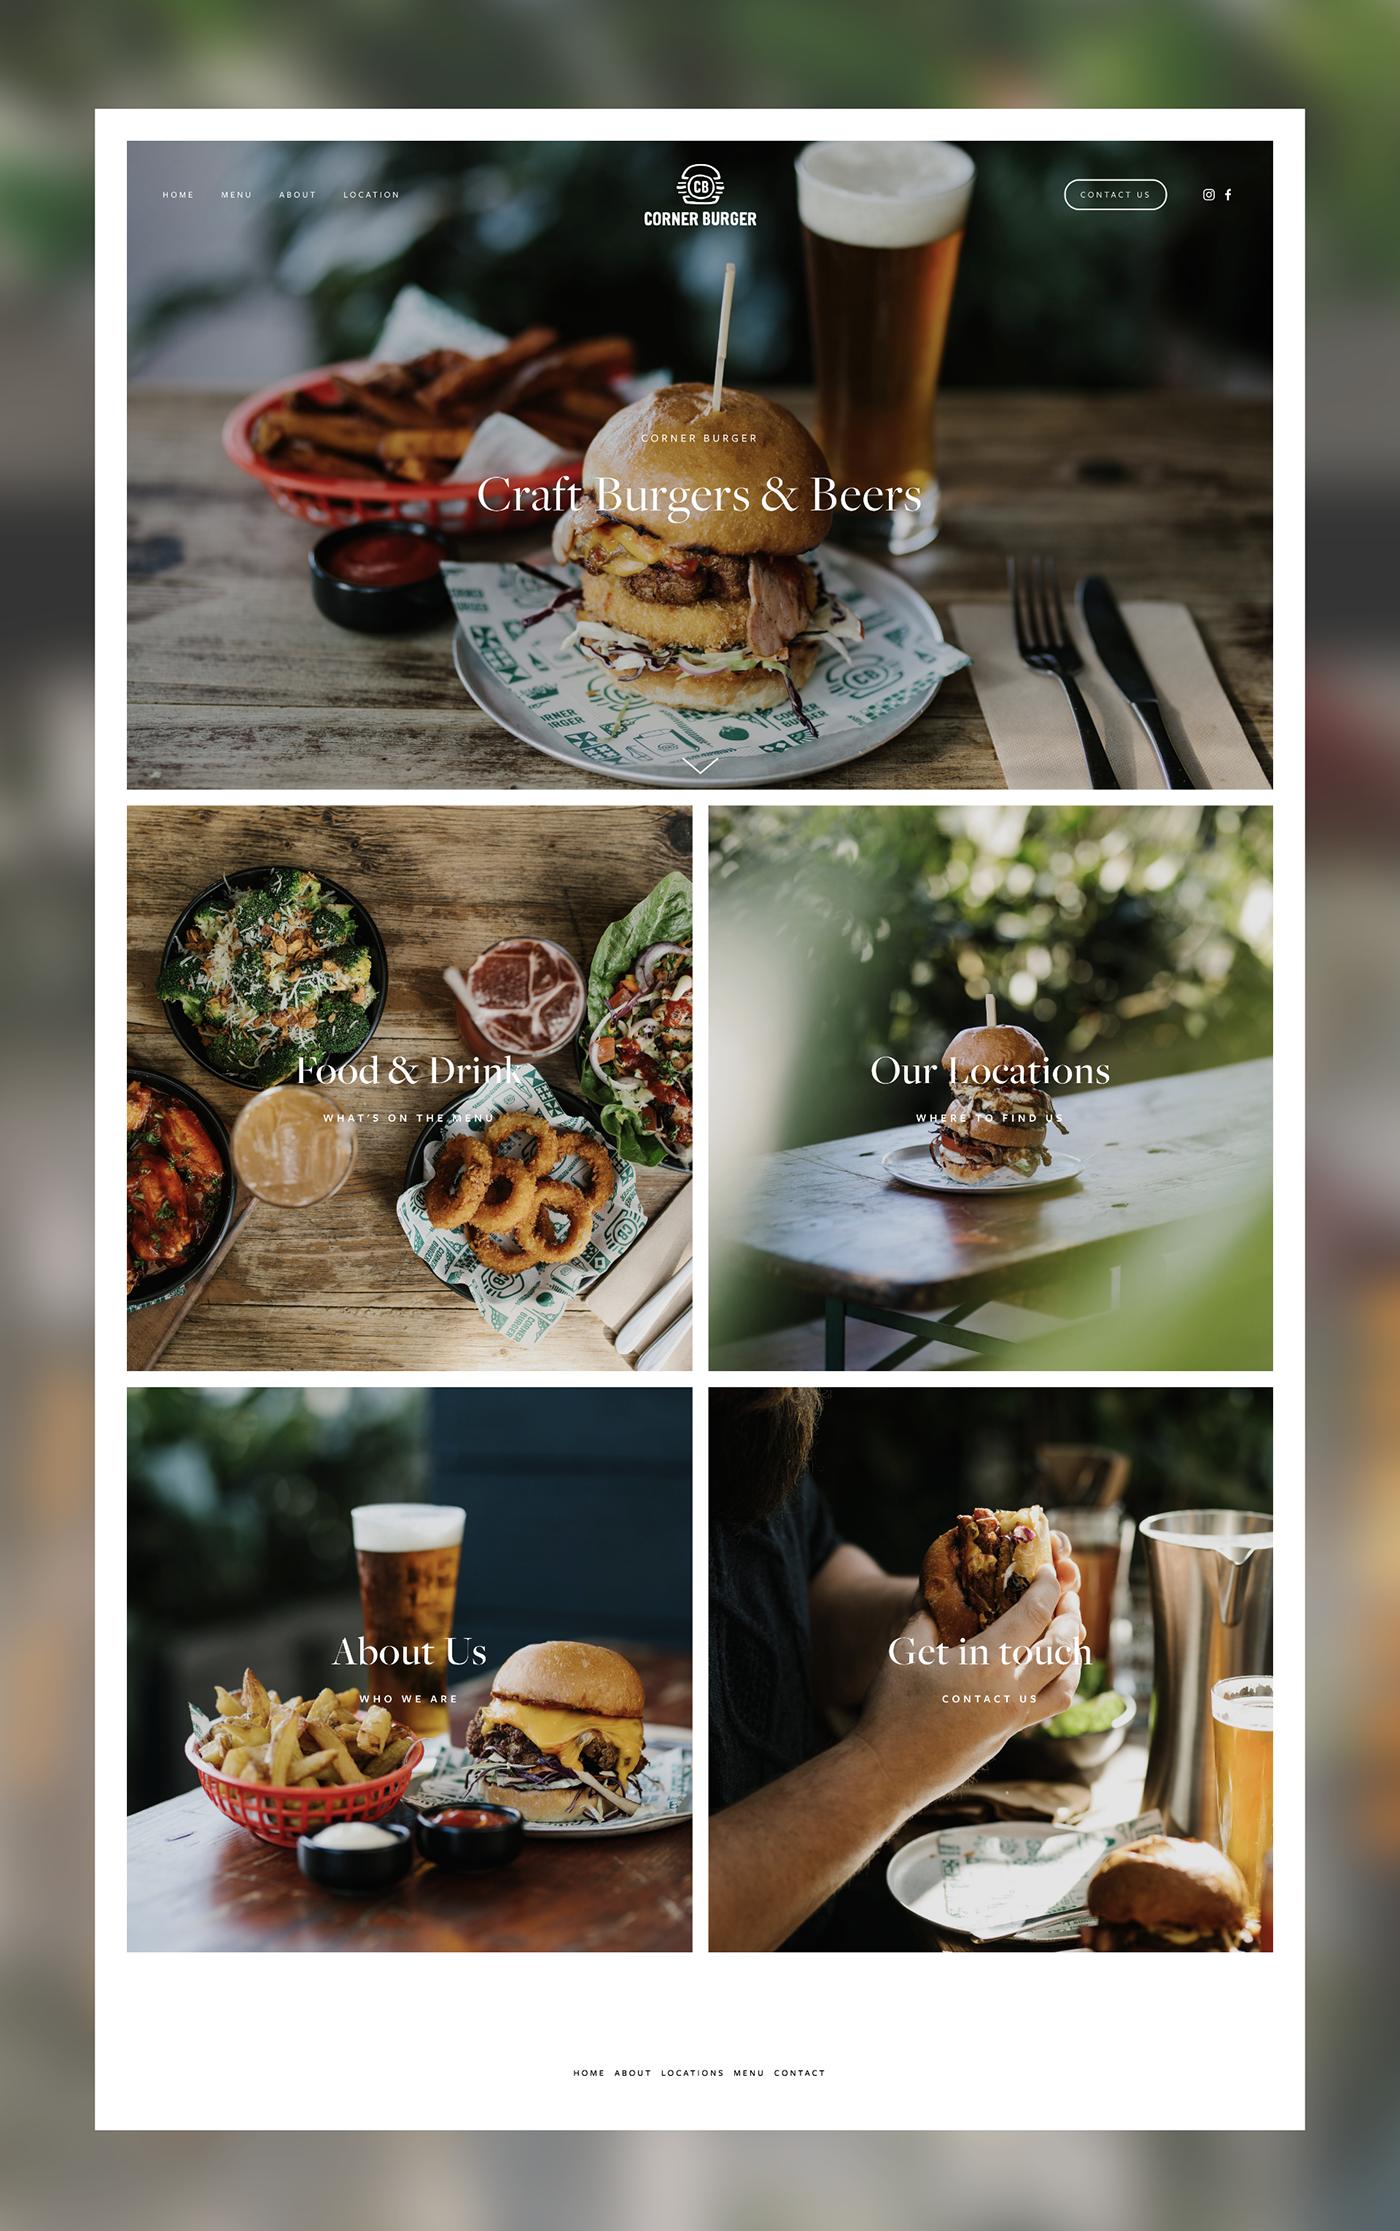 branding ,design,Photography ,food photography,Burgers,beer,Web Design ,art direction ,cafe,Food